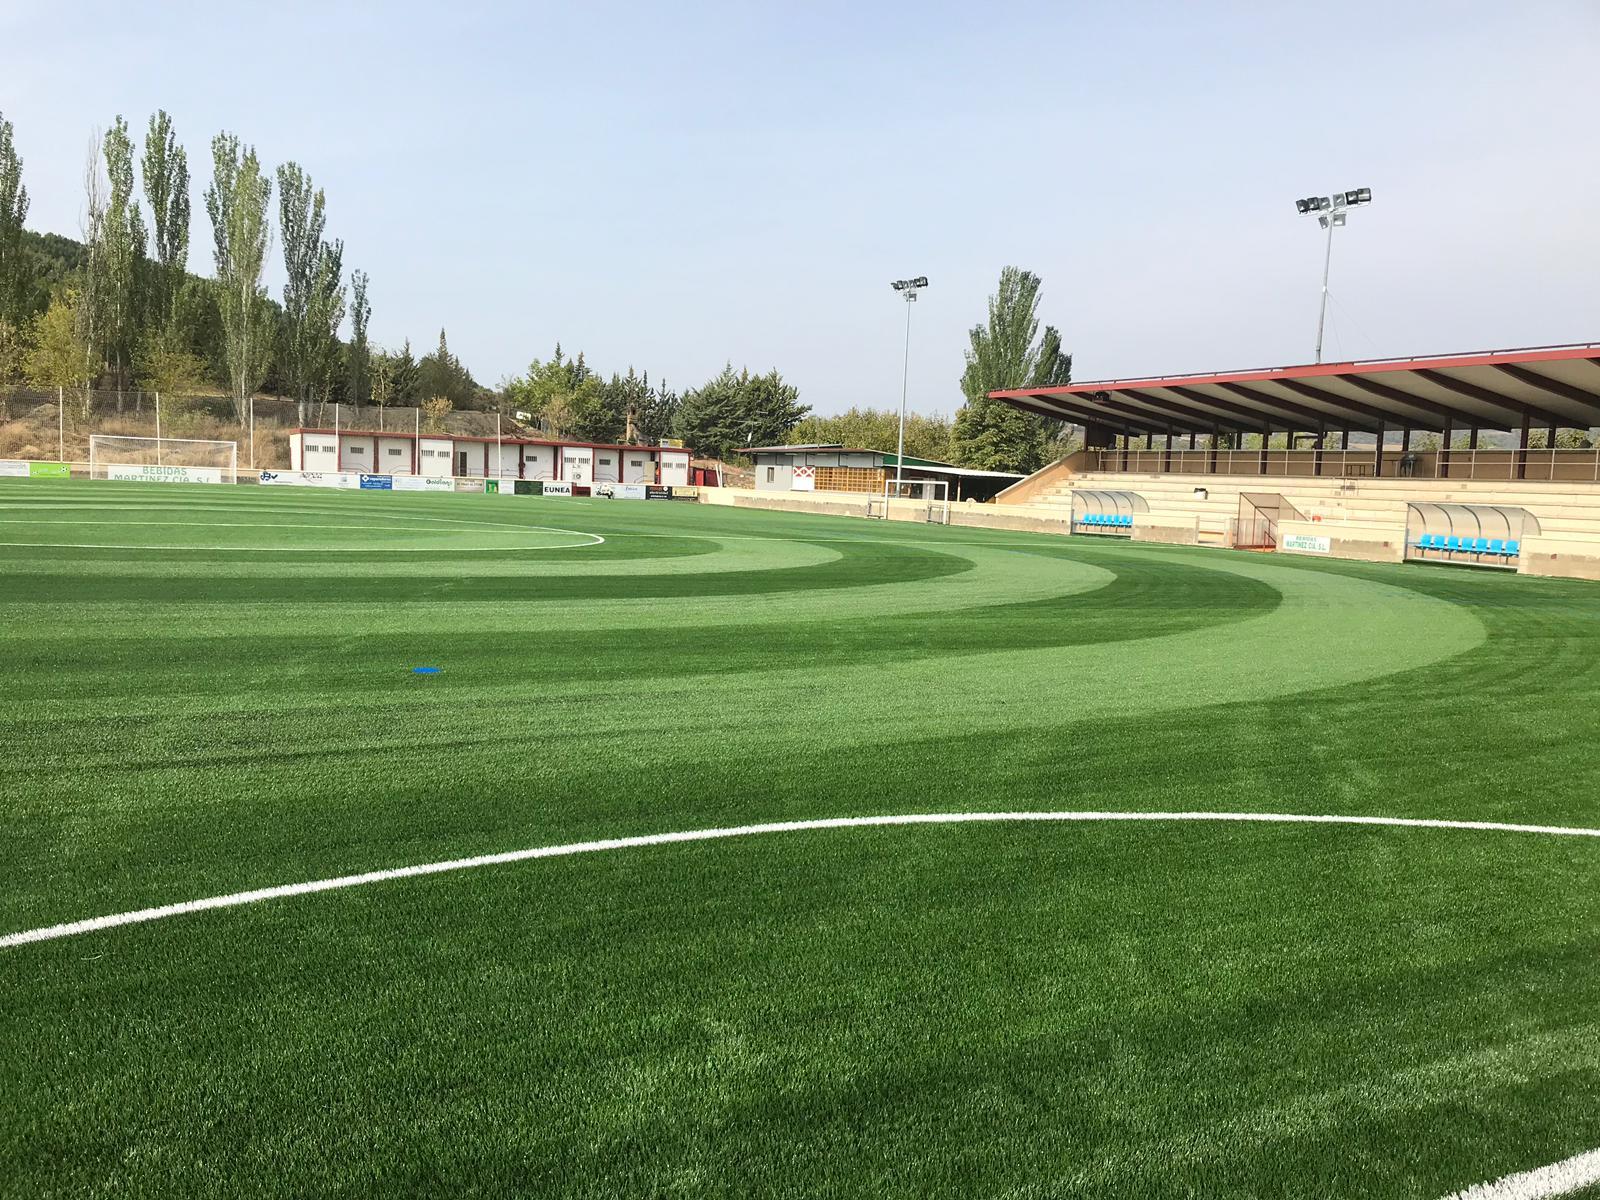 Campo de Fútbol Puente La Reina – Osabidea, Navarra Image